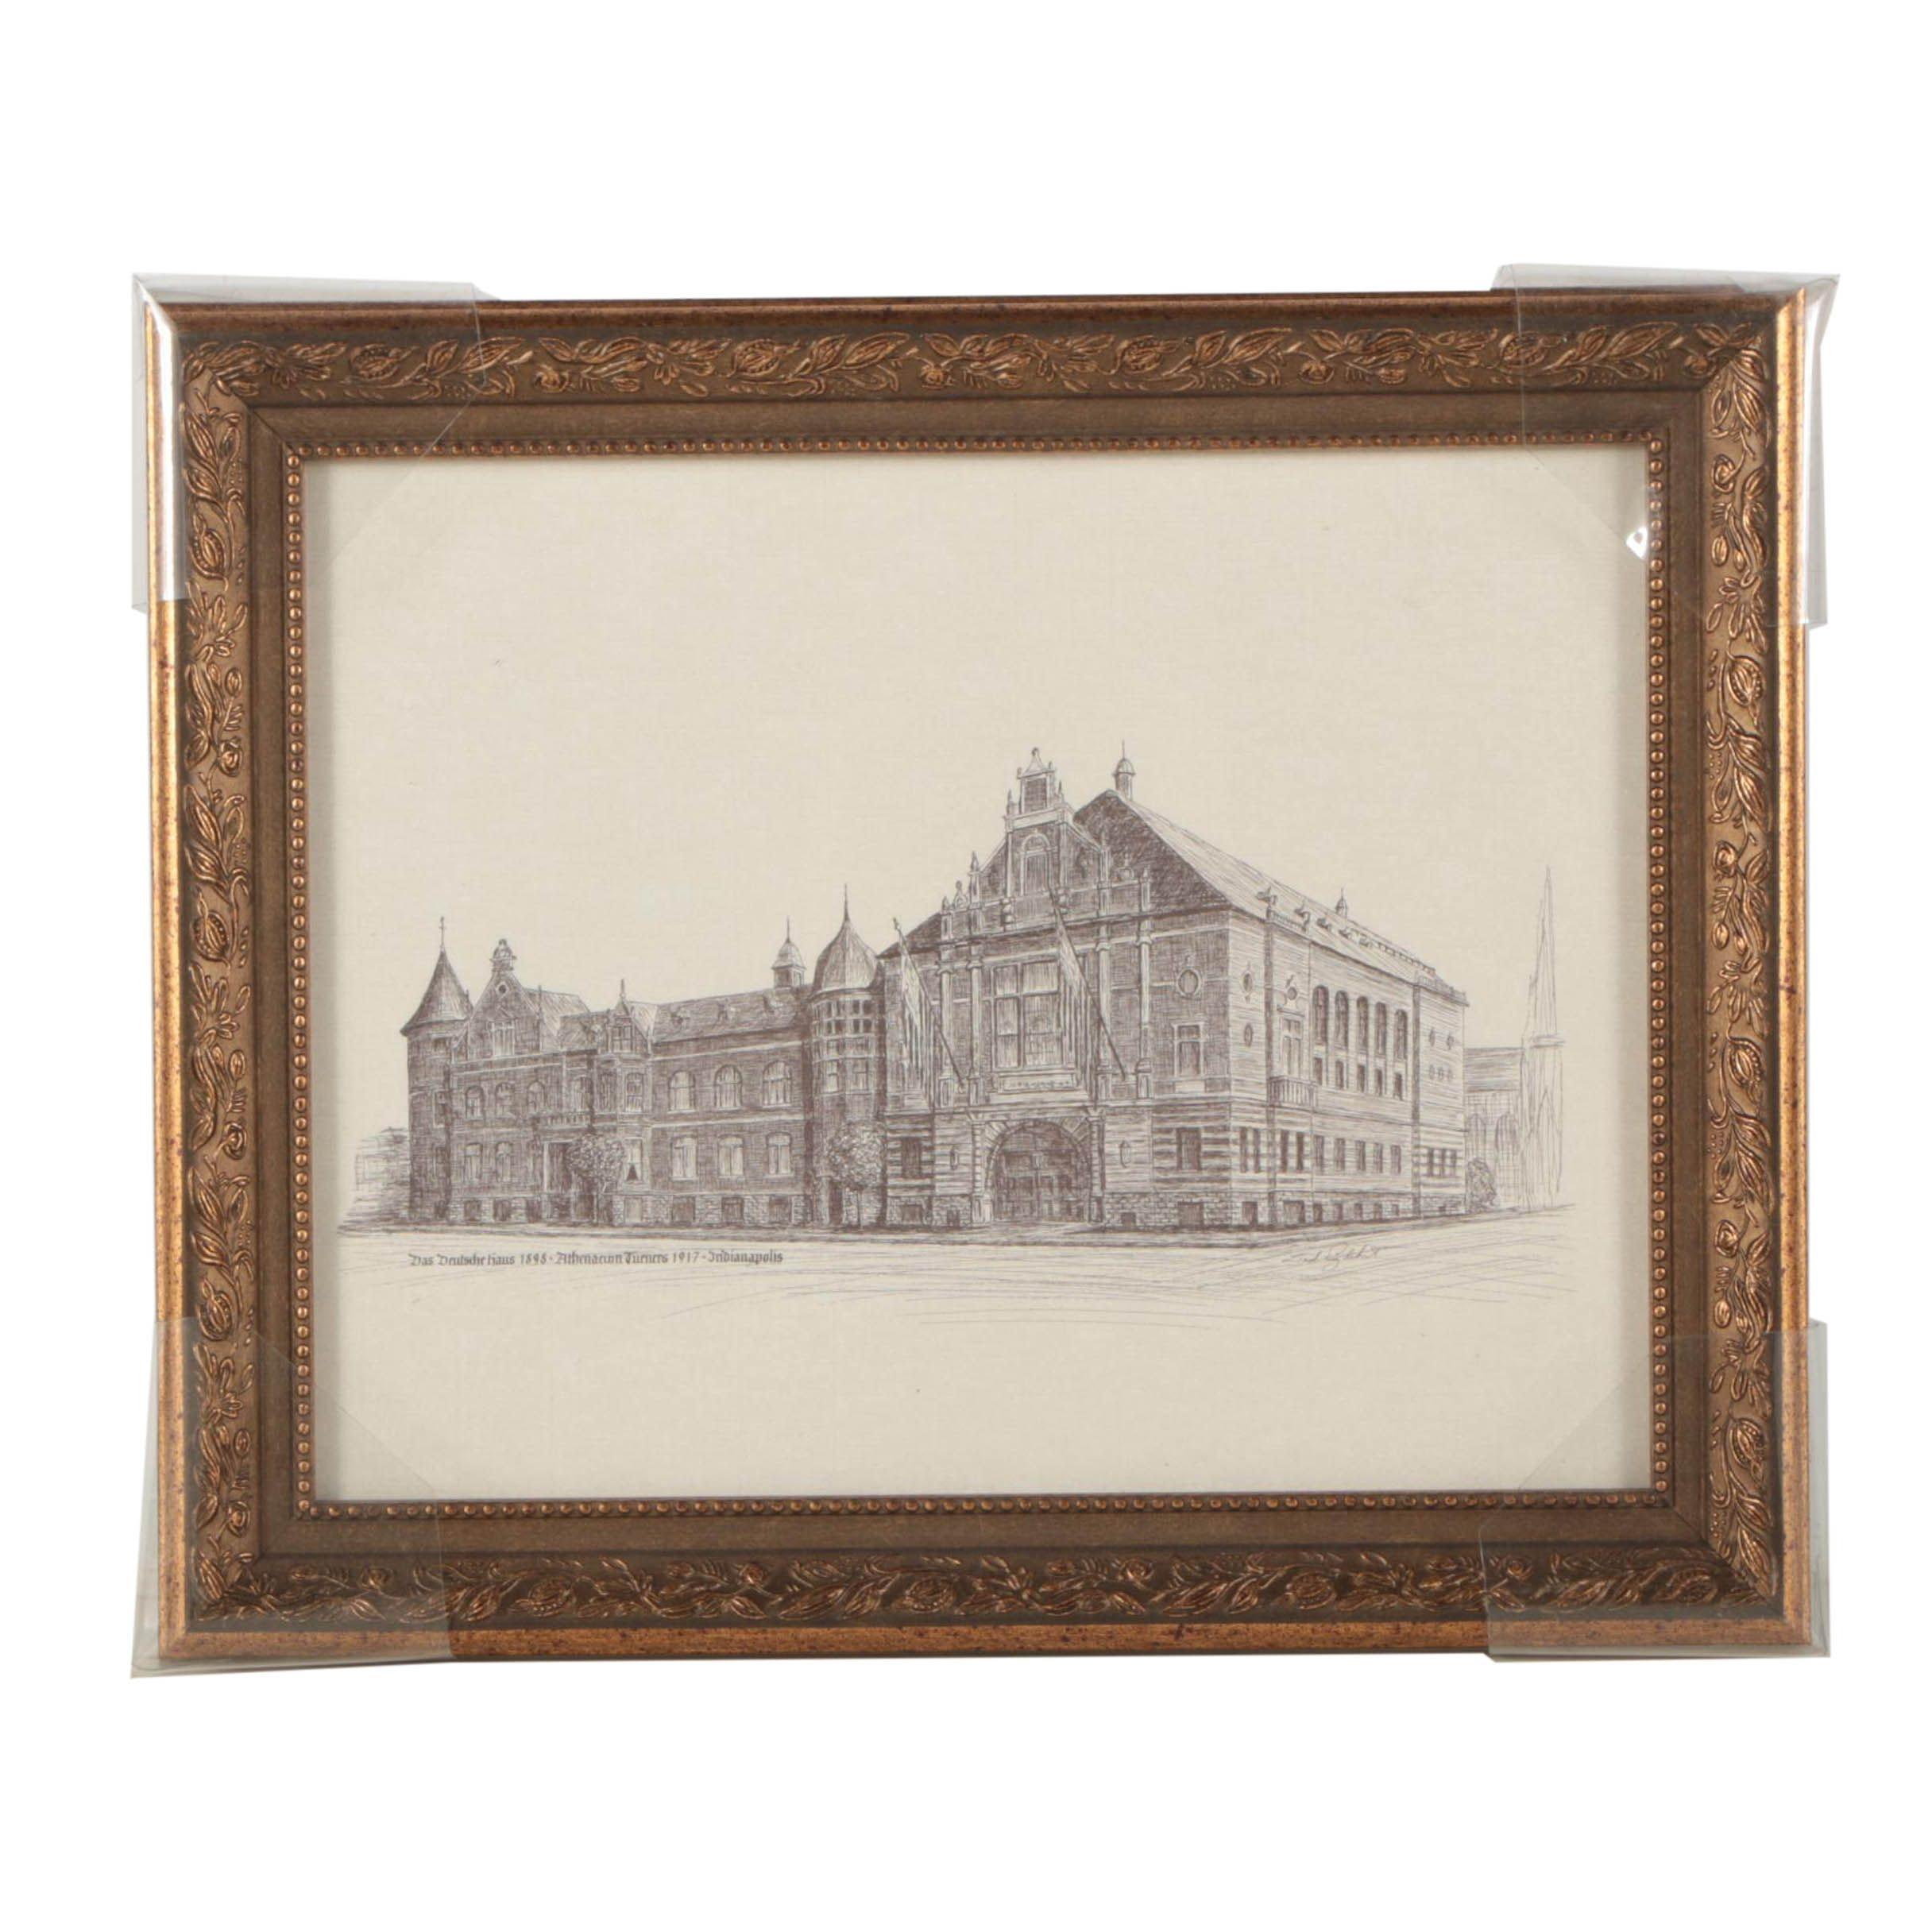 "Lithograph Print After Ted Englehart Drawing ""Das Deutsche Haus 1898"""